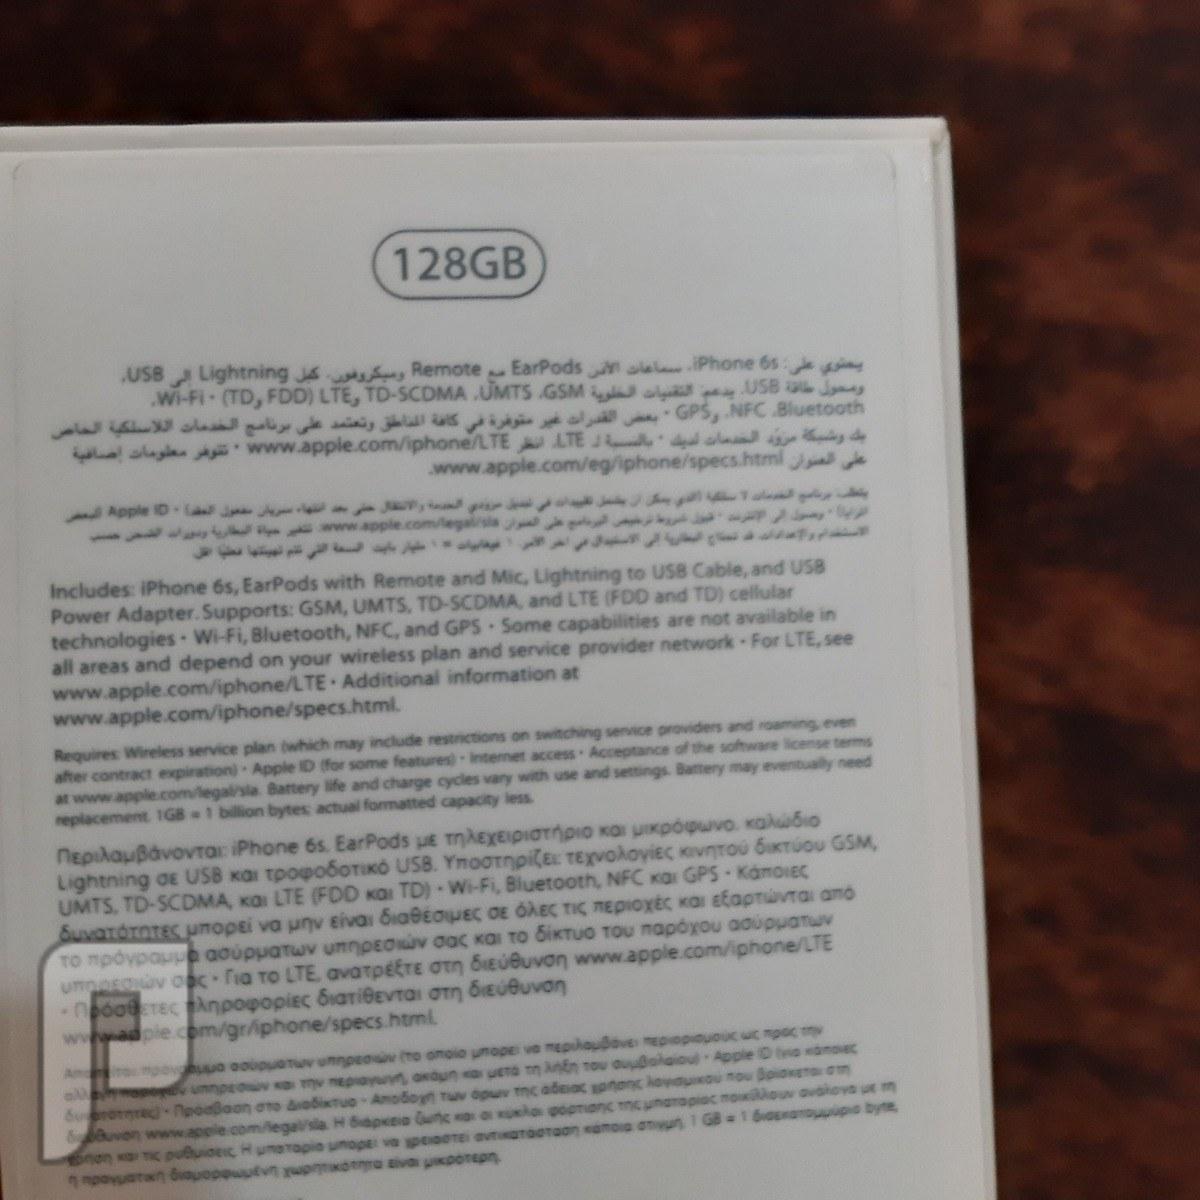 ايفون 6s جديد 128 قيقا